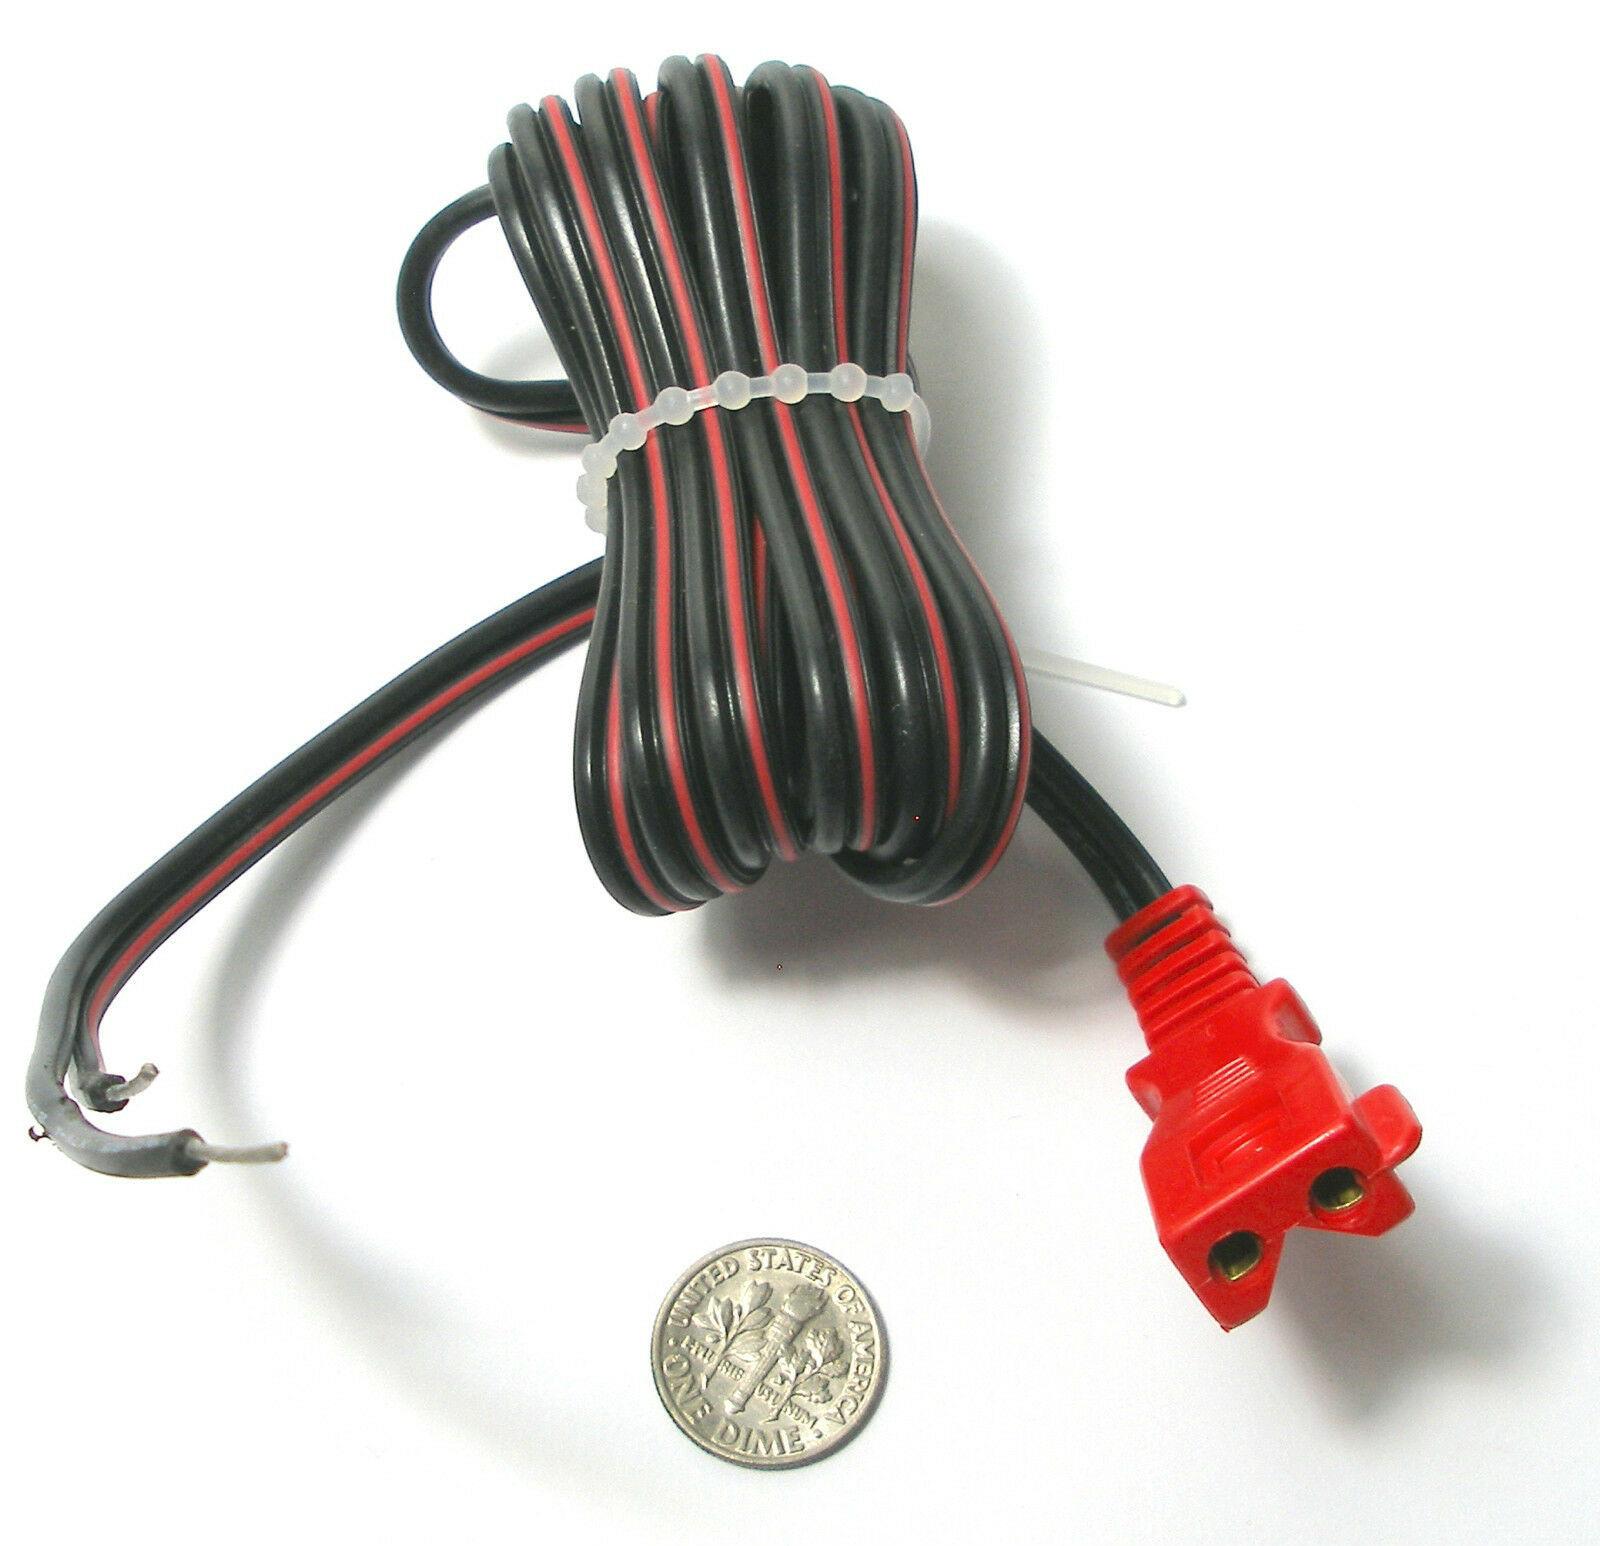 hight resolution of 6 vintage tyco ho slot car track transformer heavyduty power pig tail plug lead 6 92